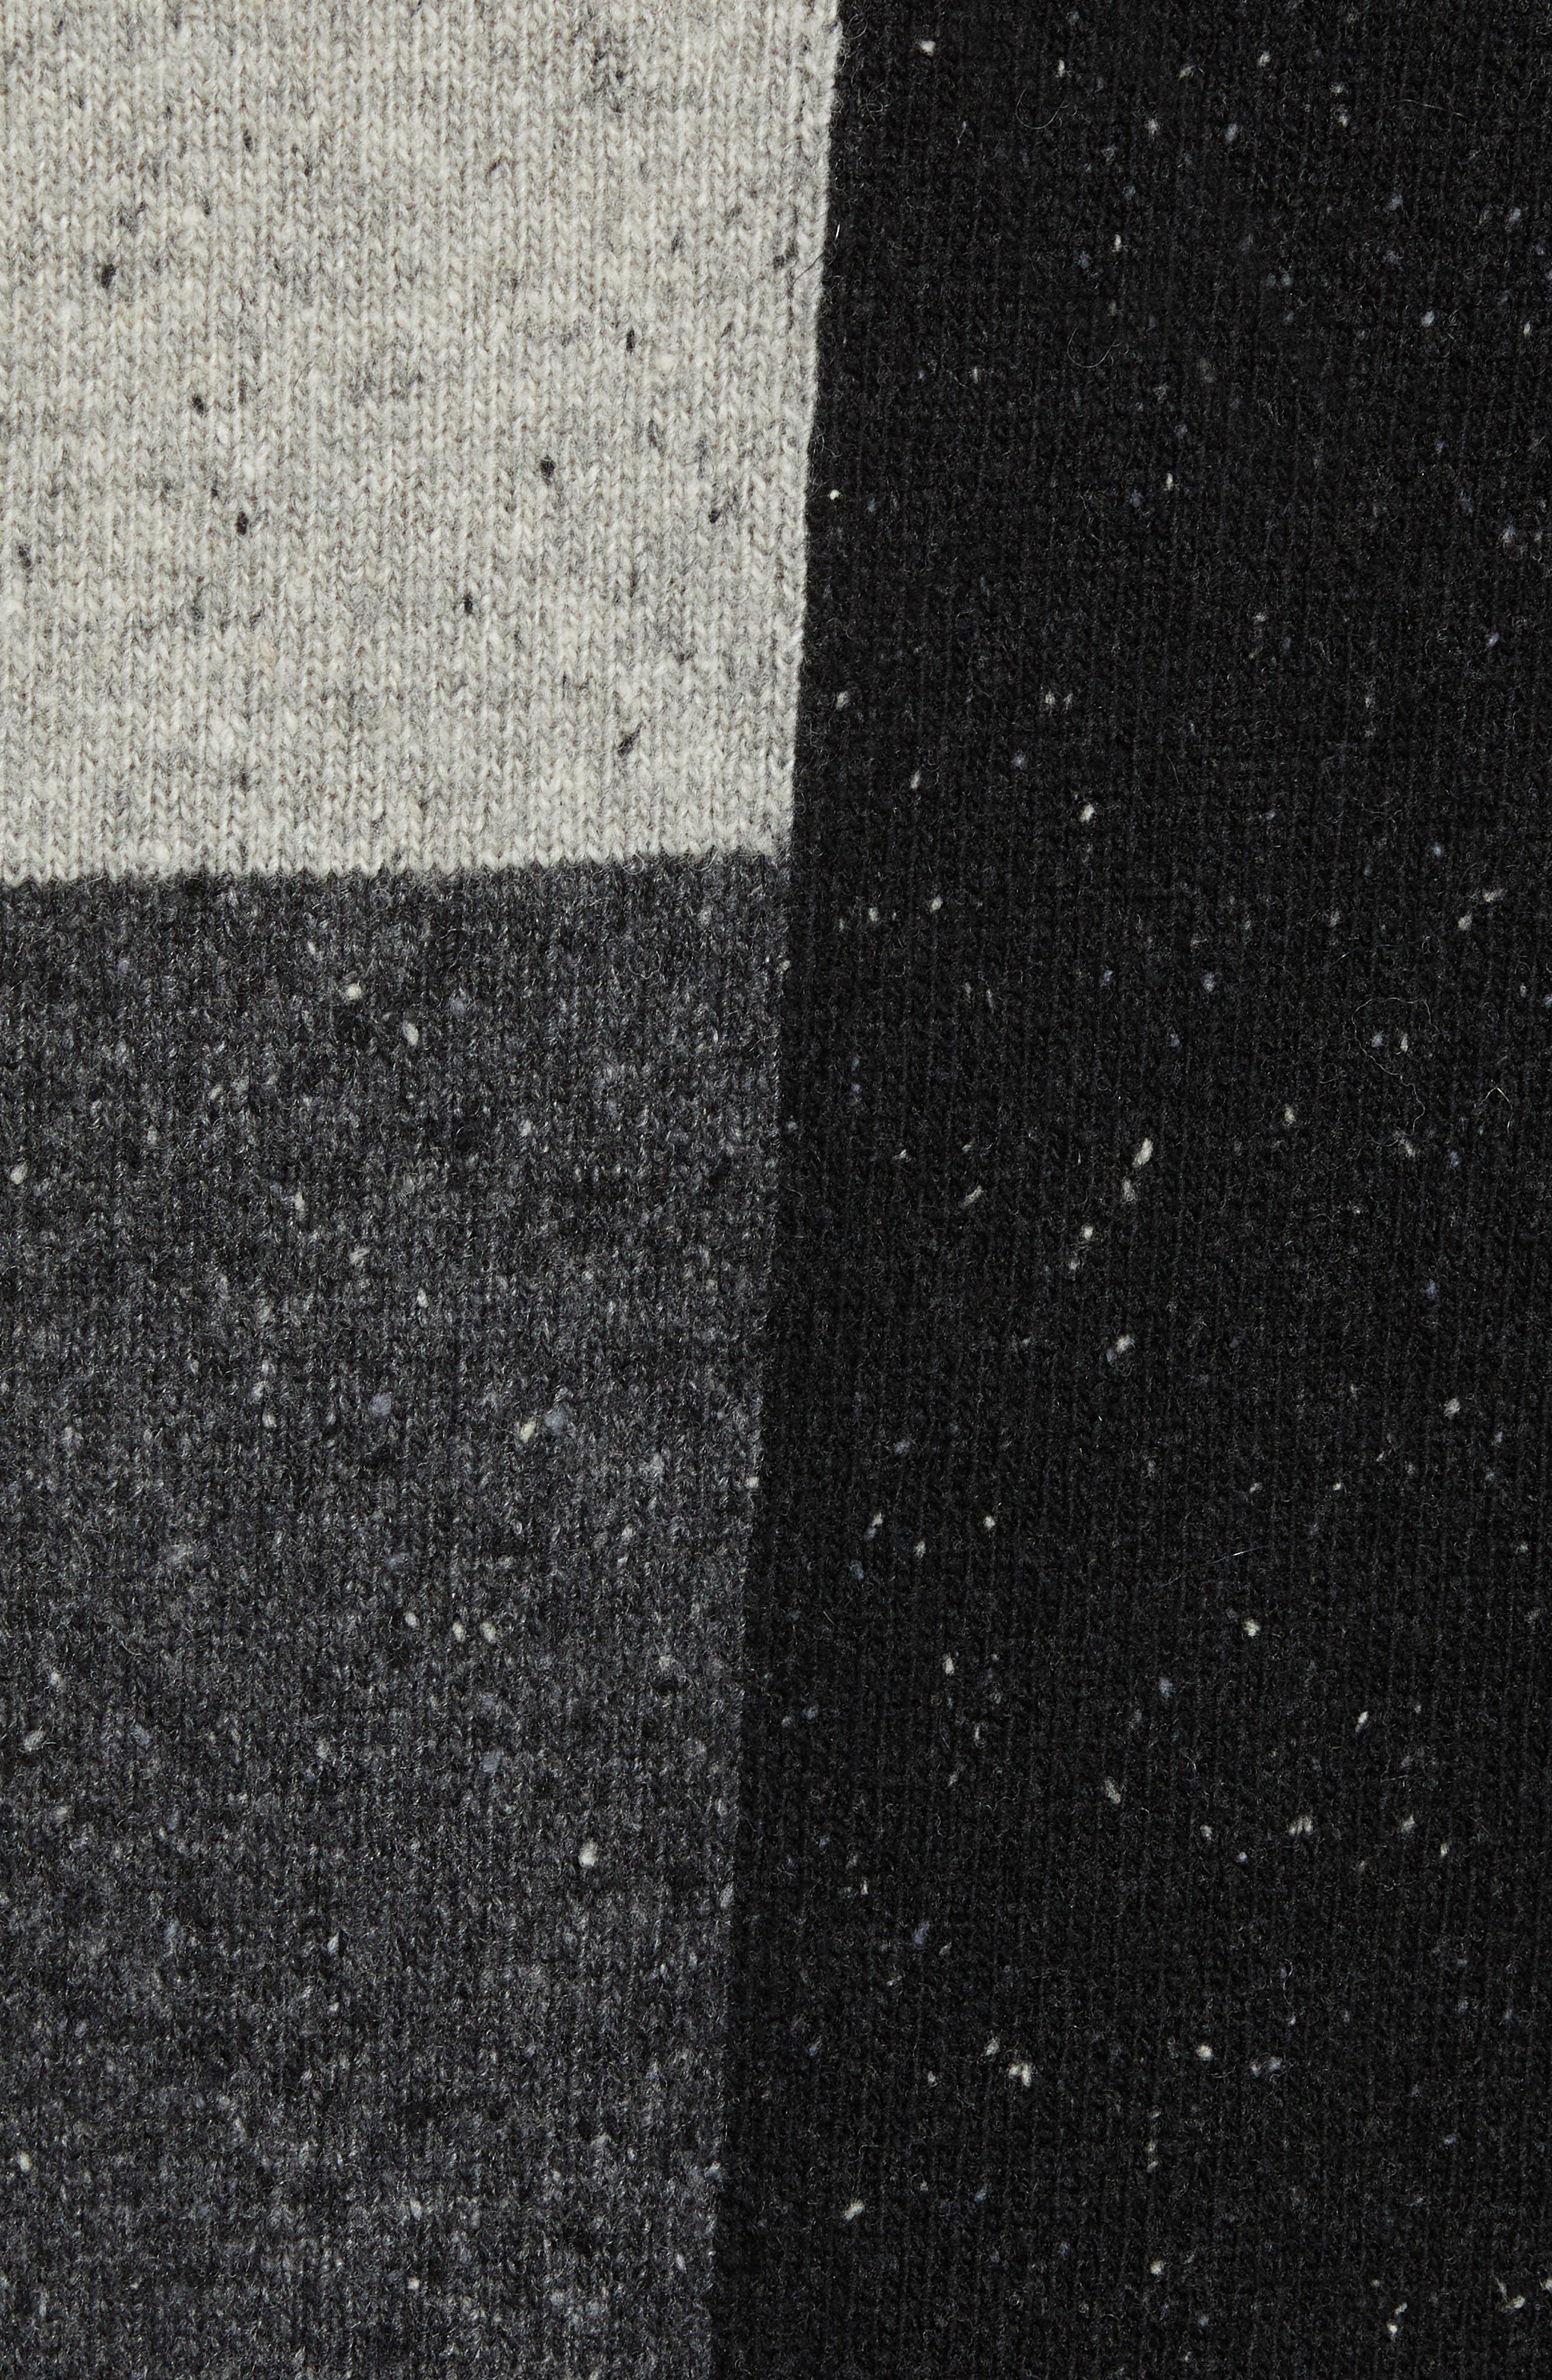 Patchwork Donegal Wool Blend Sweater,                             Alternate thumbnail 5, color,                             LIGHT GREY MELANGE CHARCOAL